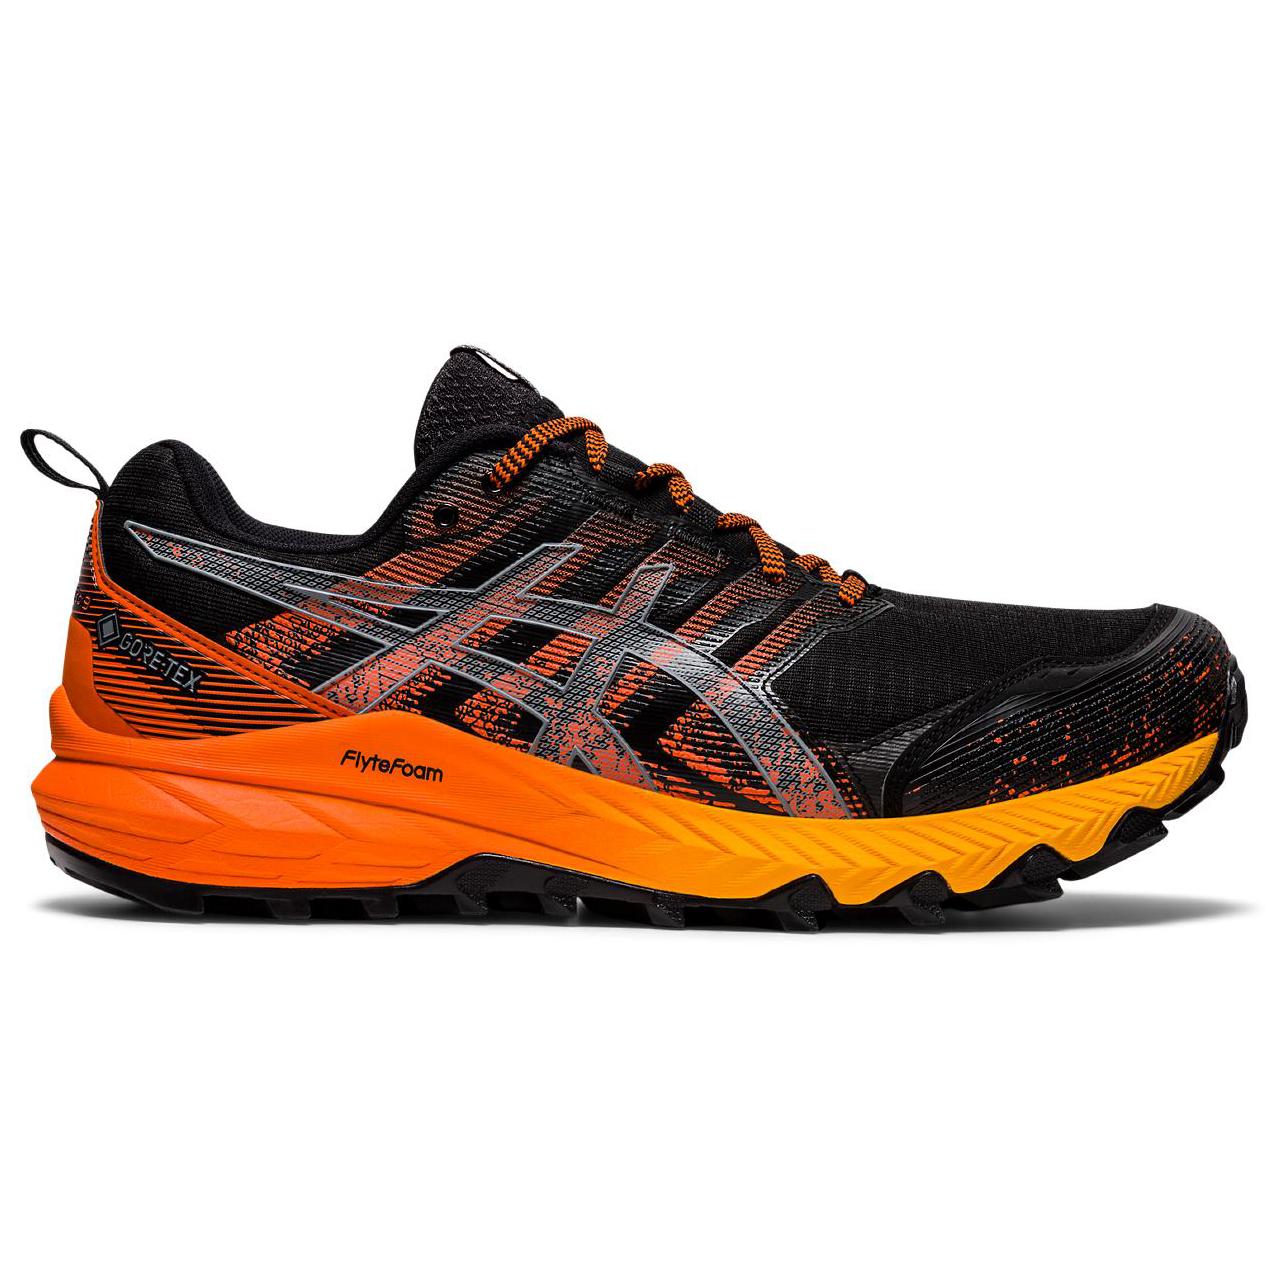 Asics - Gel-Trabuco 9 GTX - Trail running shoes - Black / Carrier Grey | 8,5 (US)